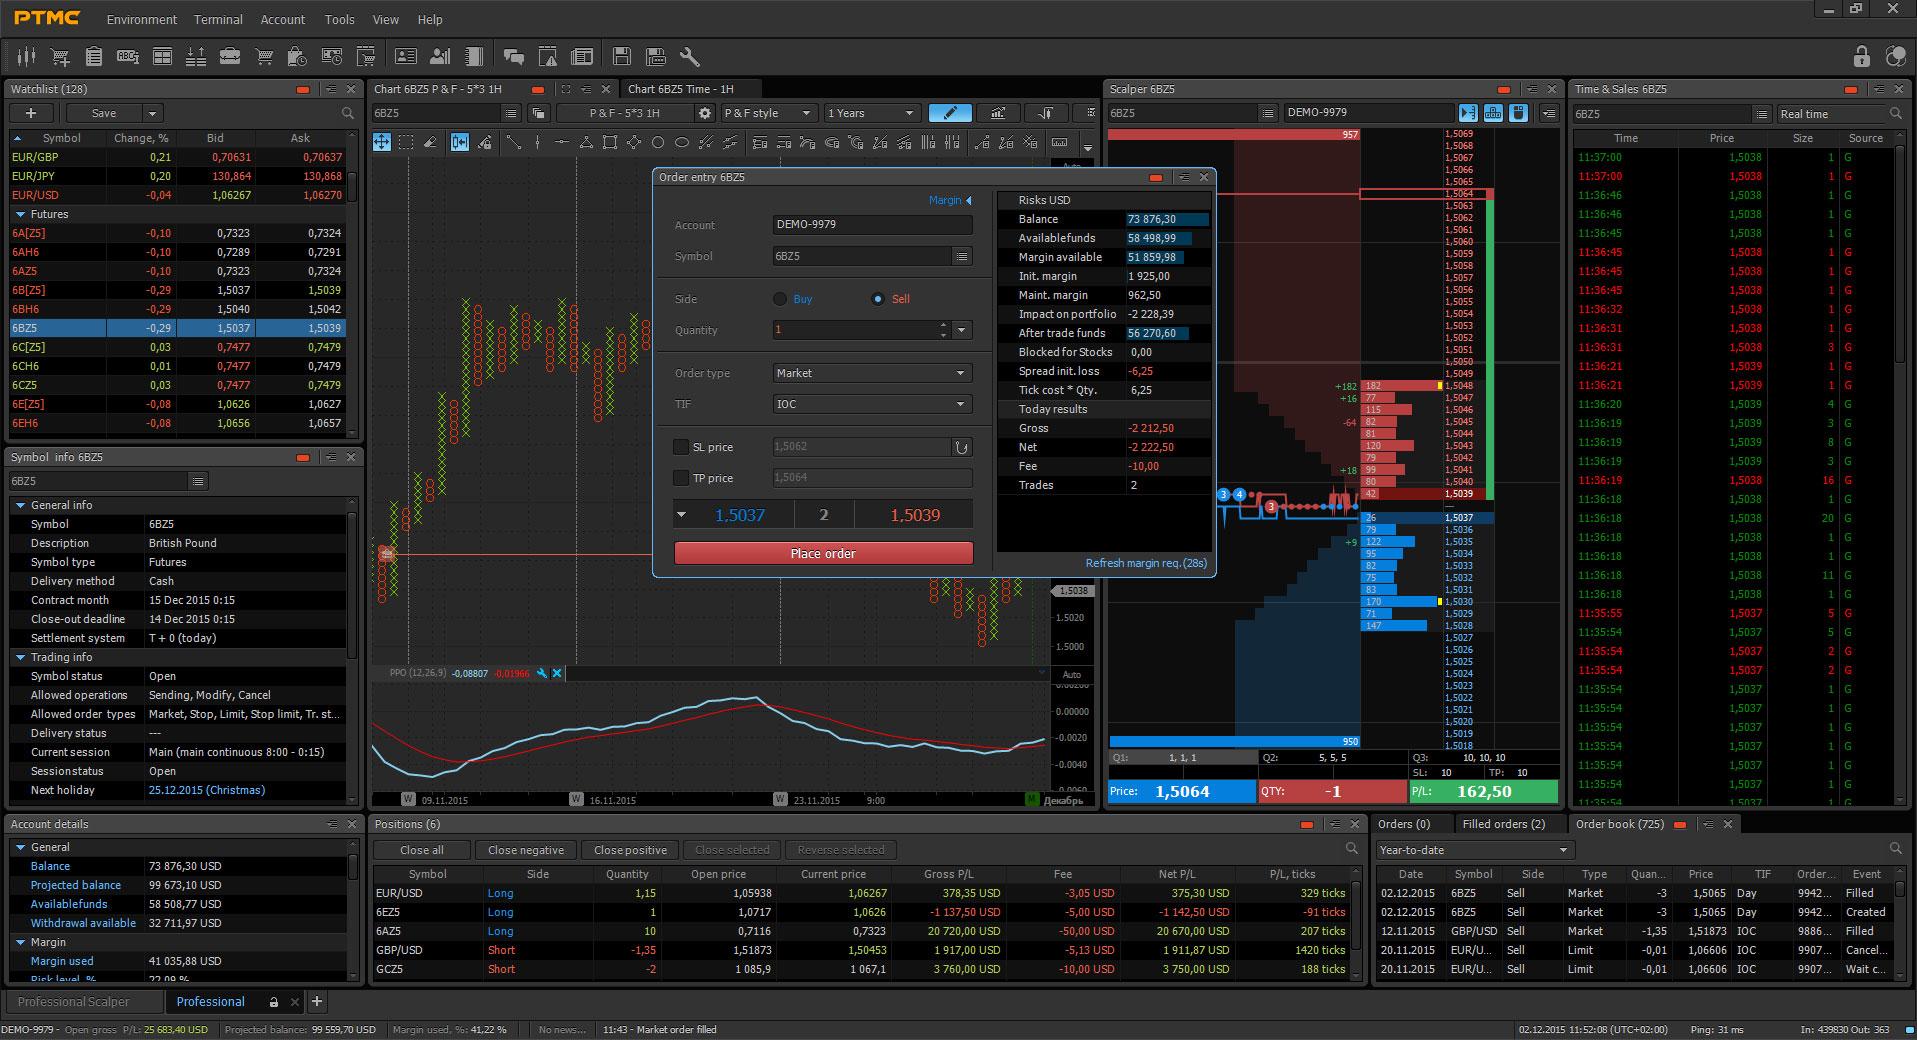 fxcm trading platforms